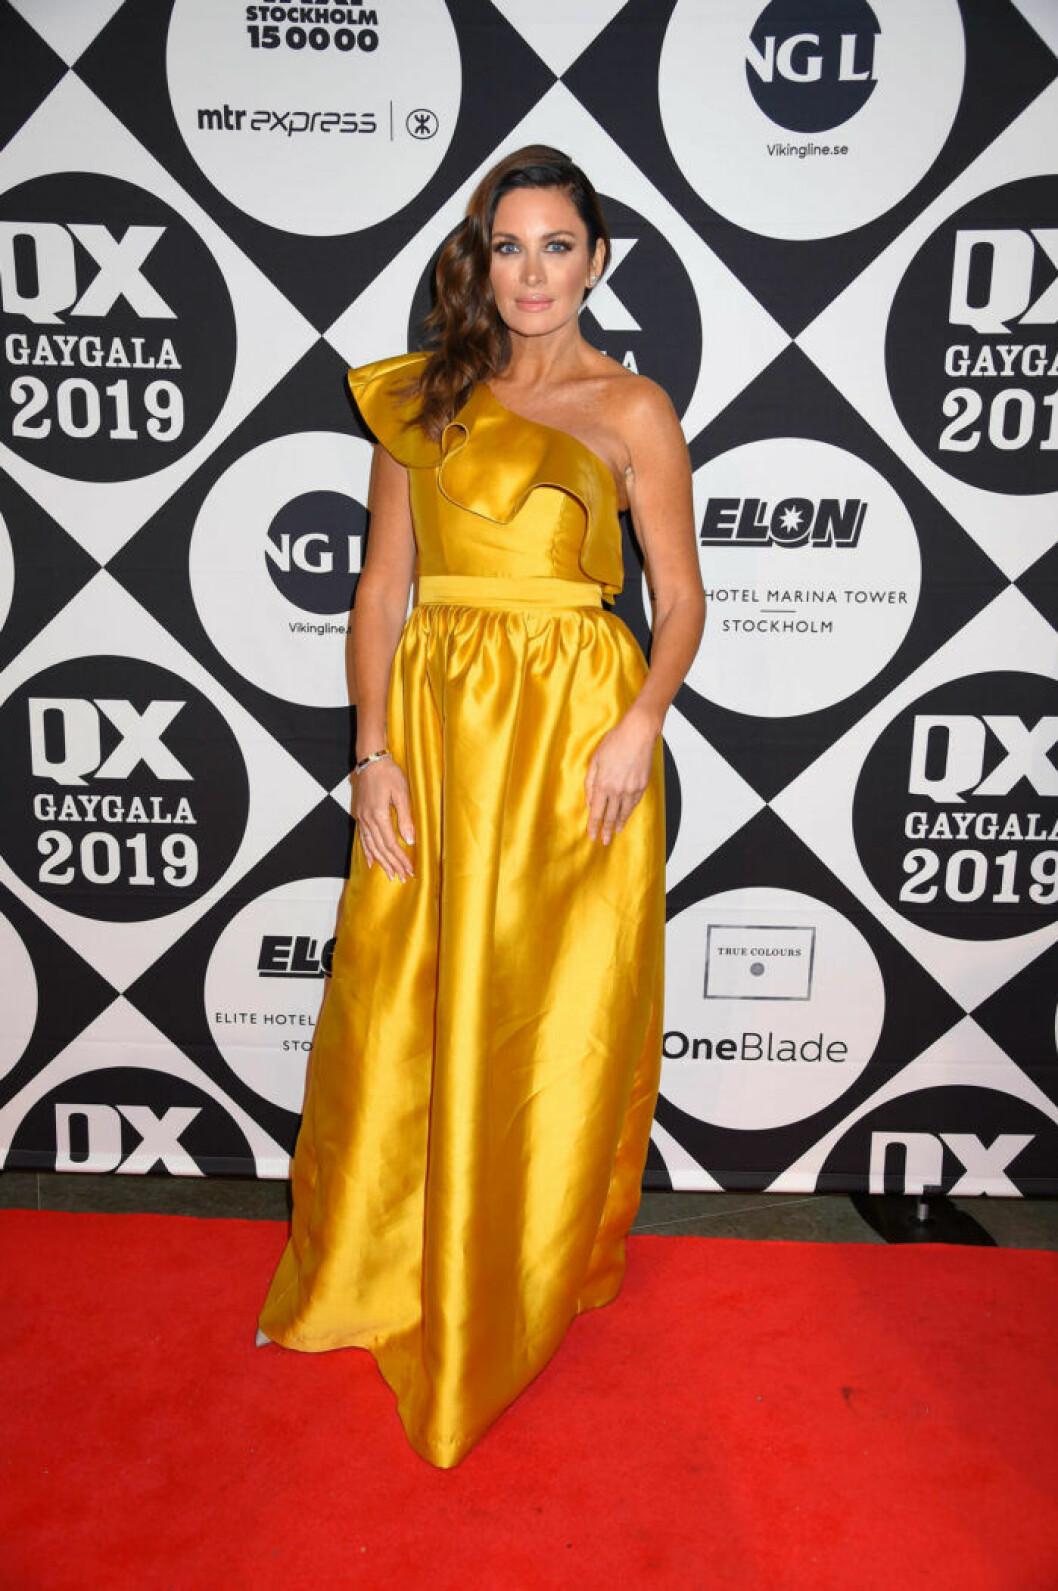 Carolina Gynning på QX-galan